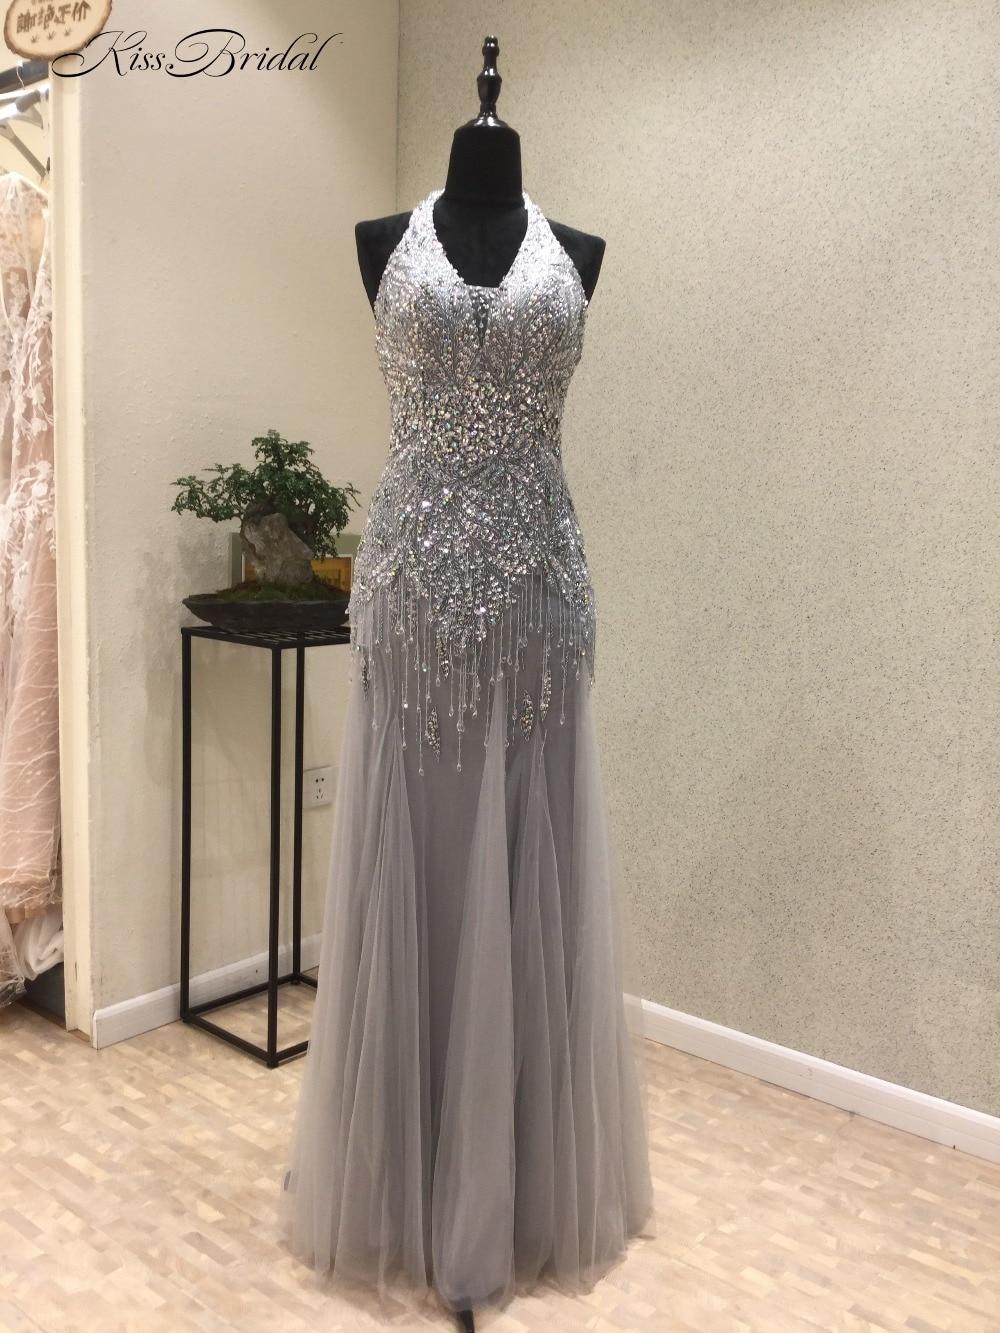 New Sexy Mermaid Prom Dresses 2018 Halter Neck Sleeveless